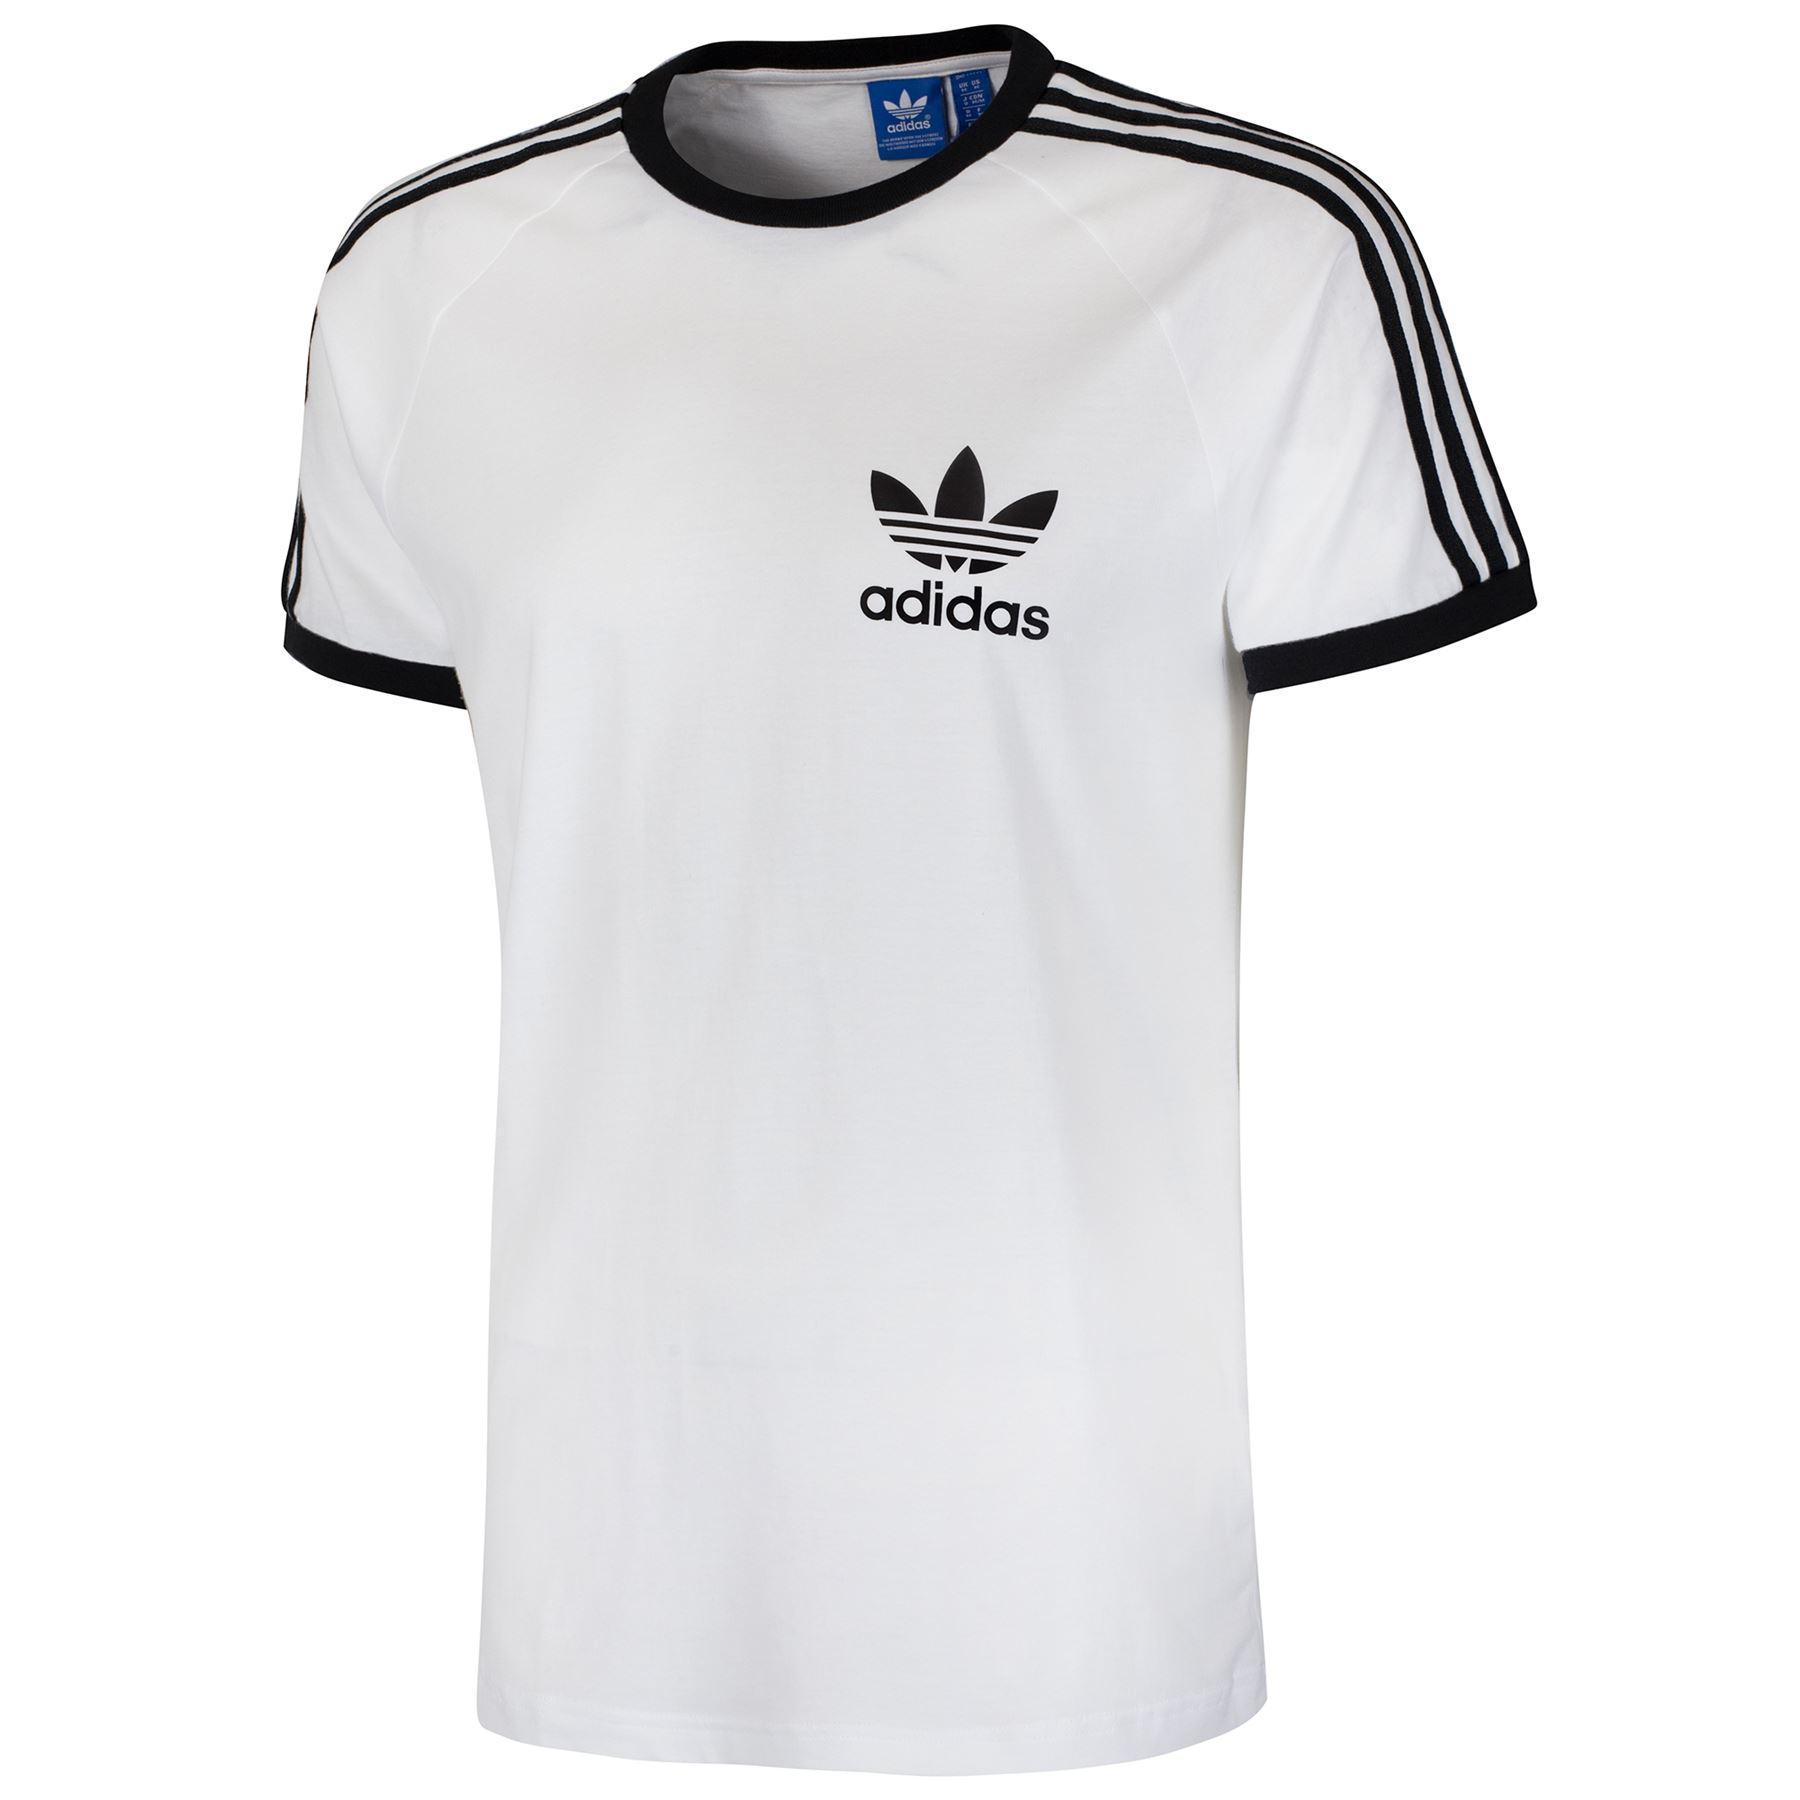 Adidas originals california tee men 39 s multi colour size for Adidas trefoil t shirt